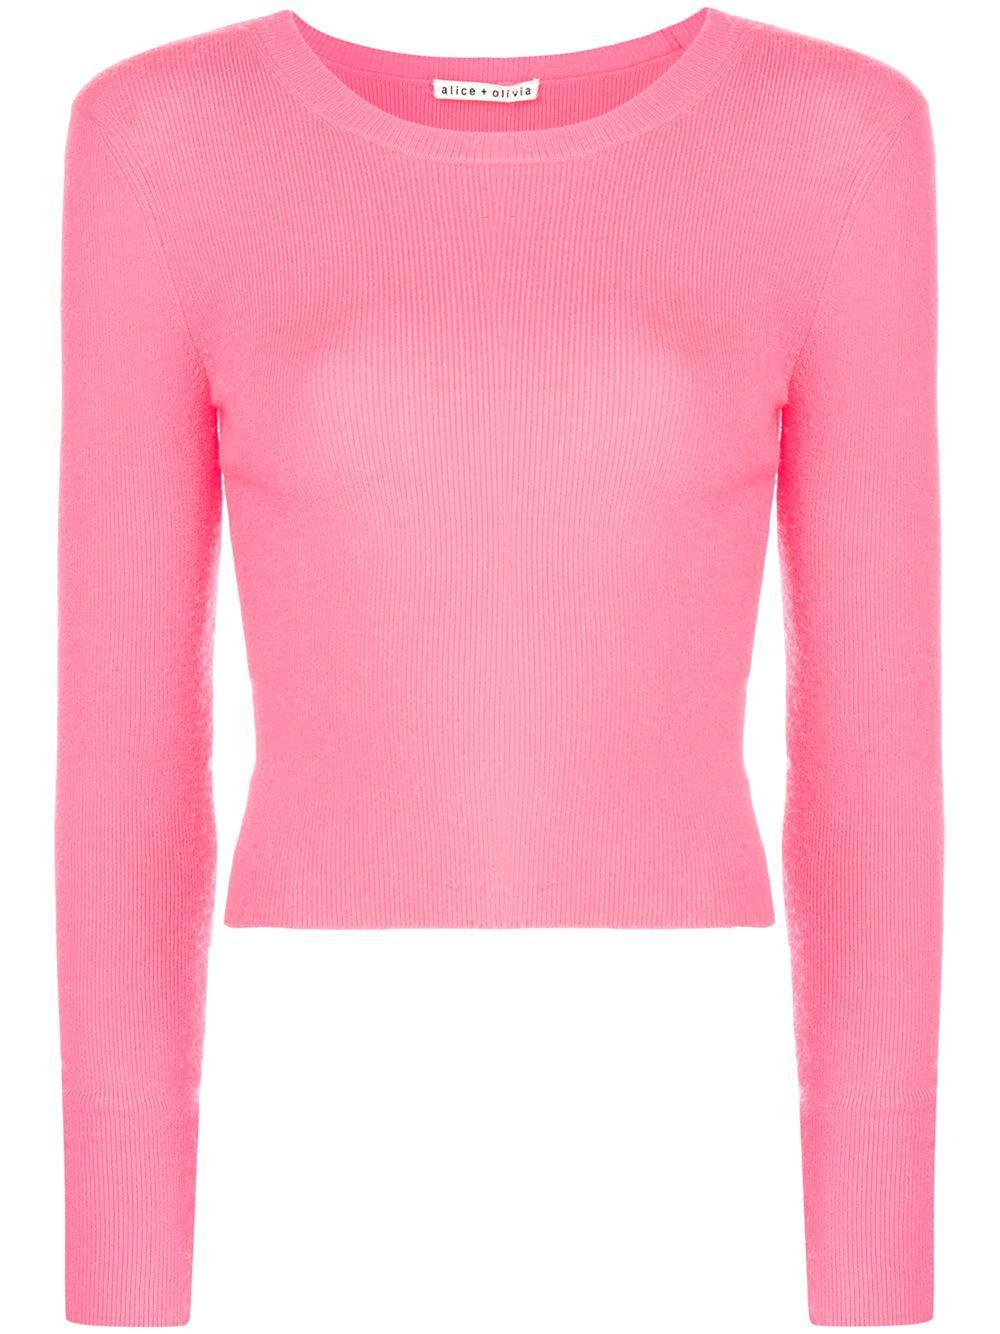 Ciara Long Sleeve Cropped Pullover